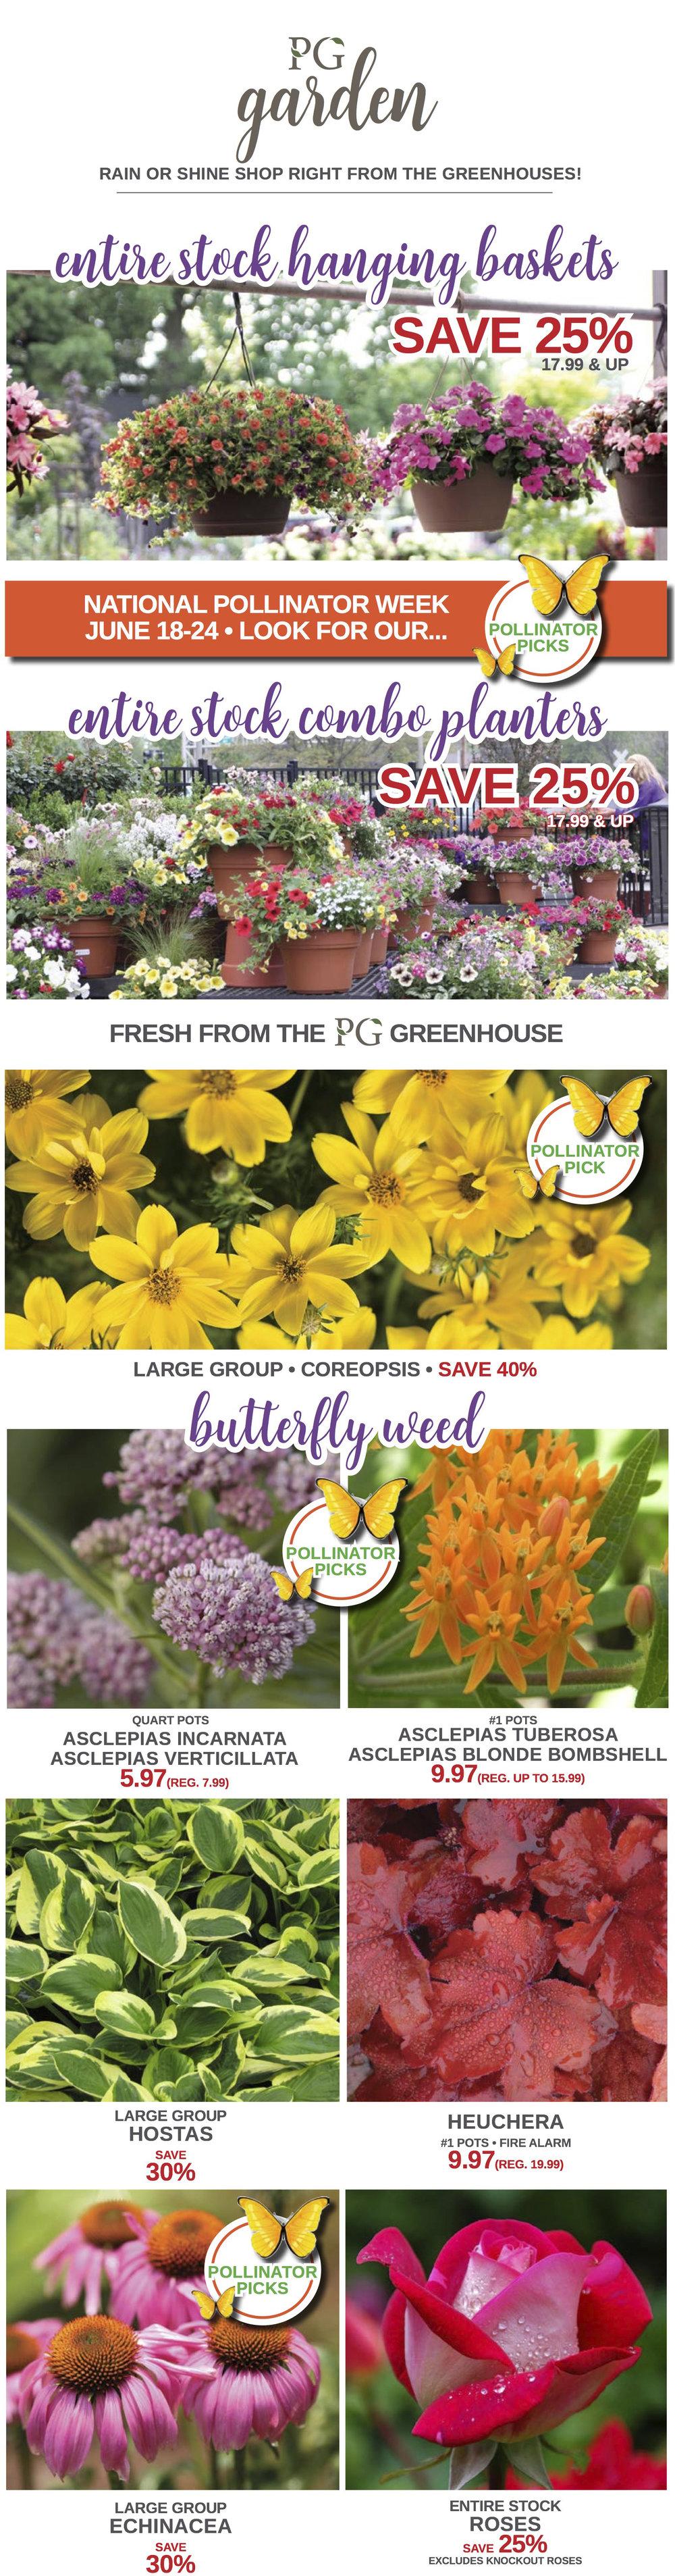 PG-WebsiteSalesPage-6-3-2018-plants.jpg